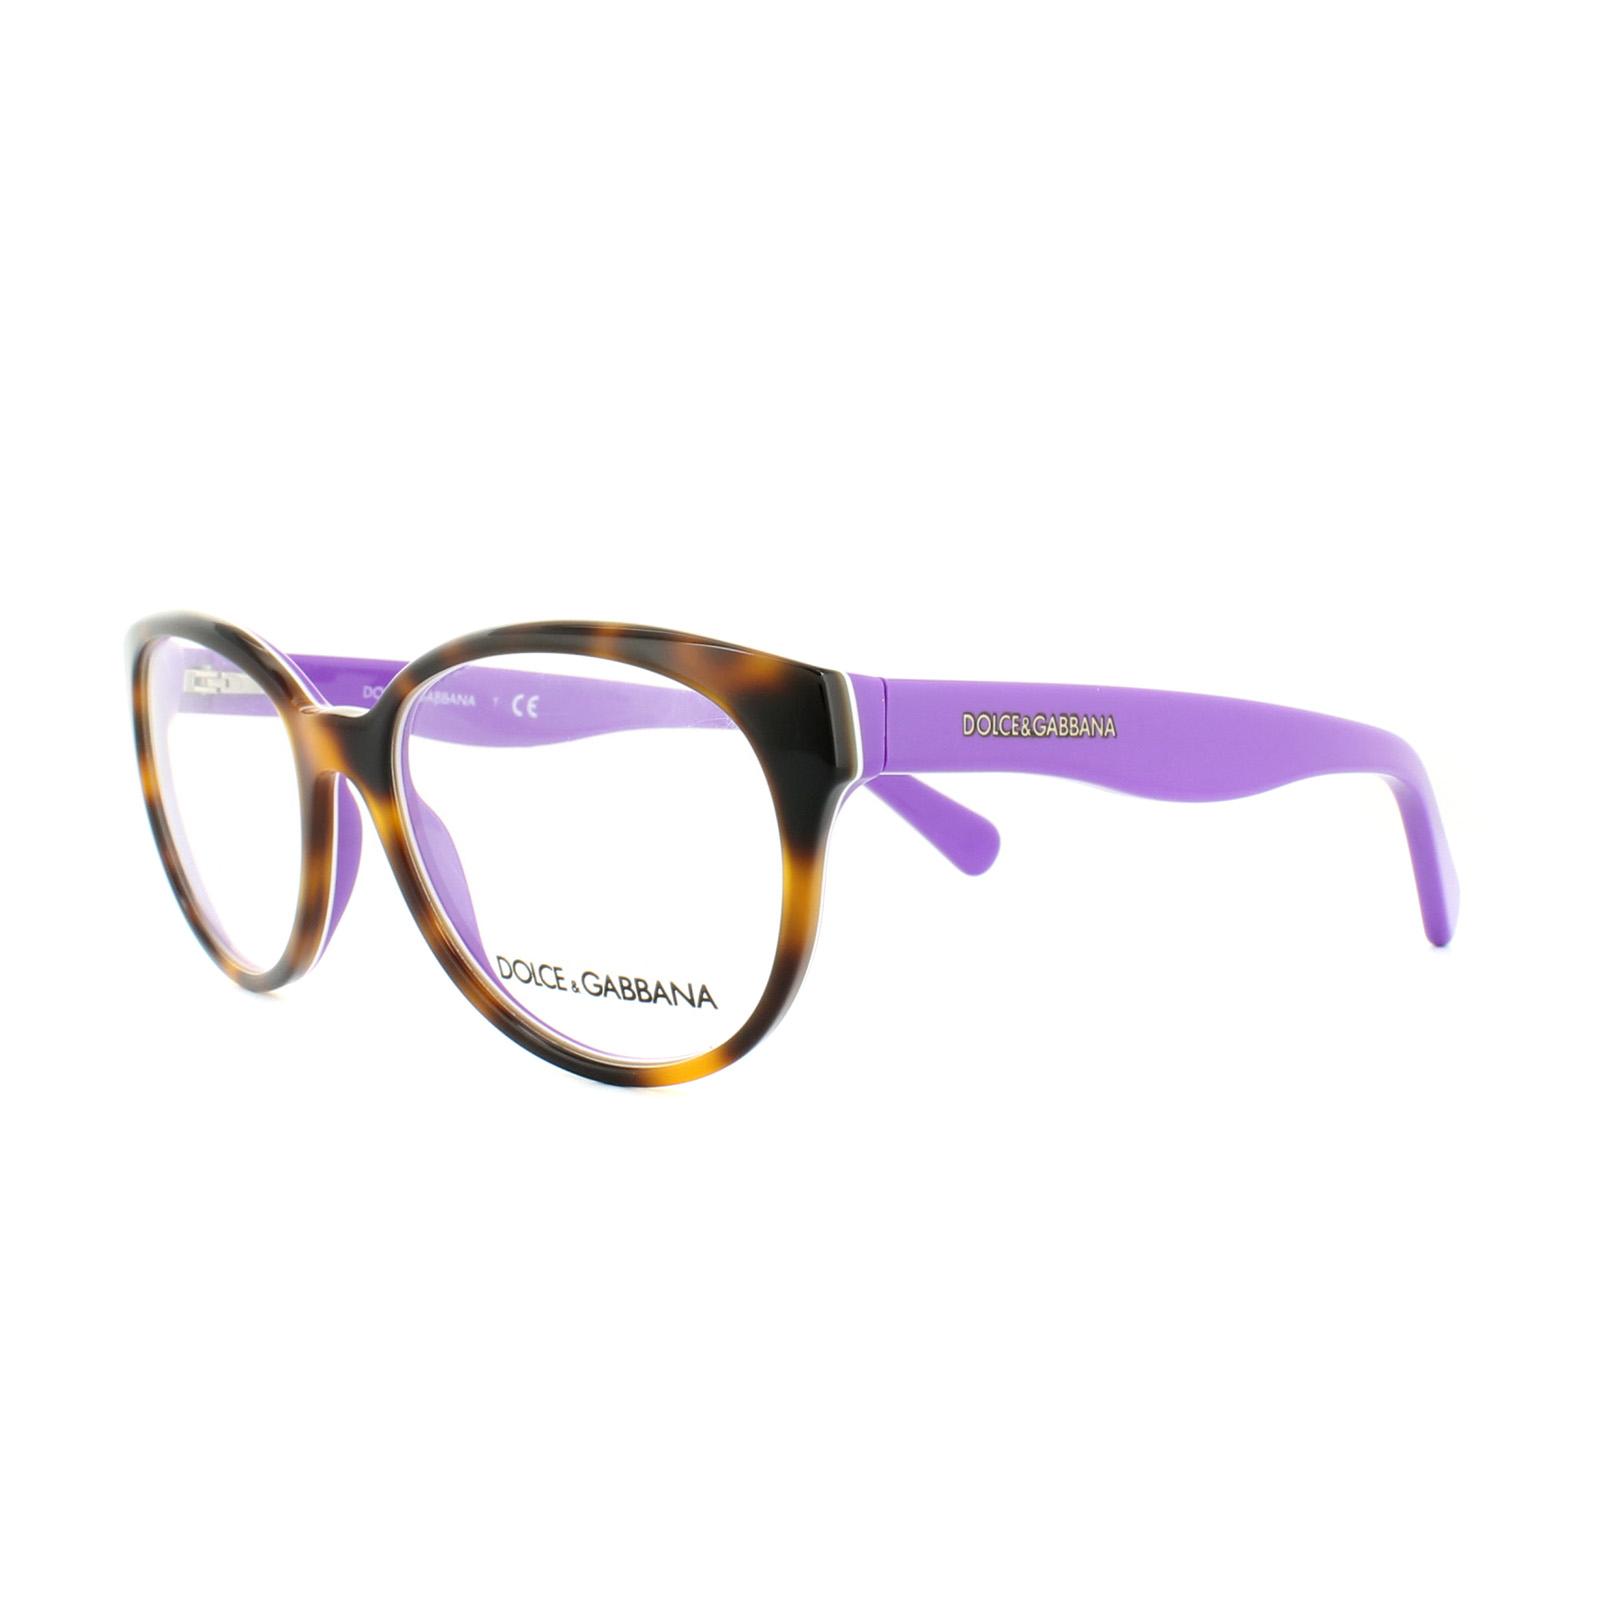 d2a218319df6 Sentinel Dolce and Gabbana Glasses Frames DG 3146P 2608 Top Havana Violet  Womens 52mm